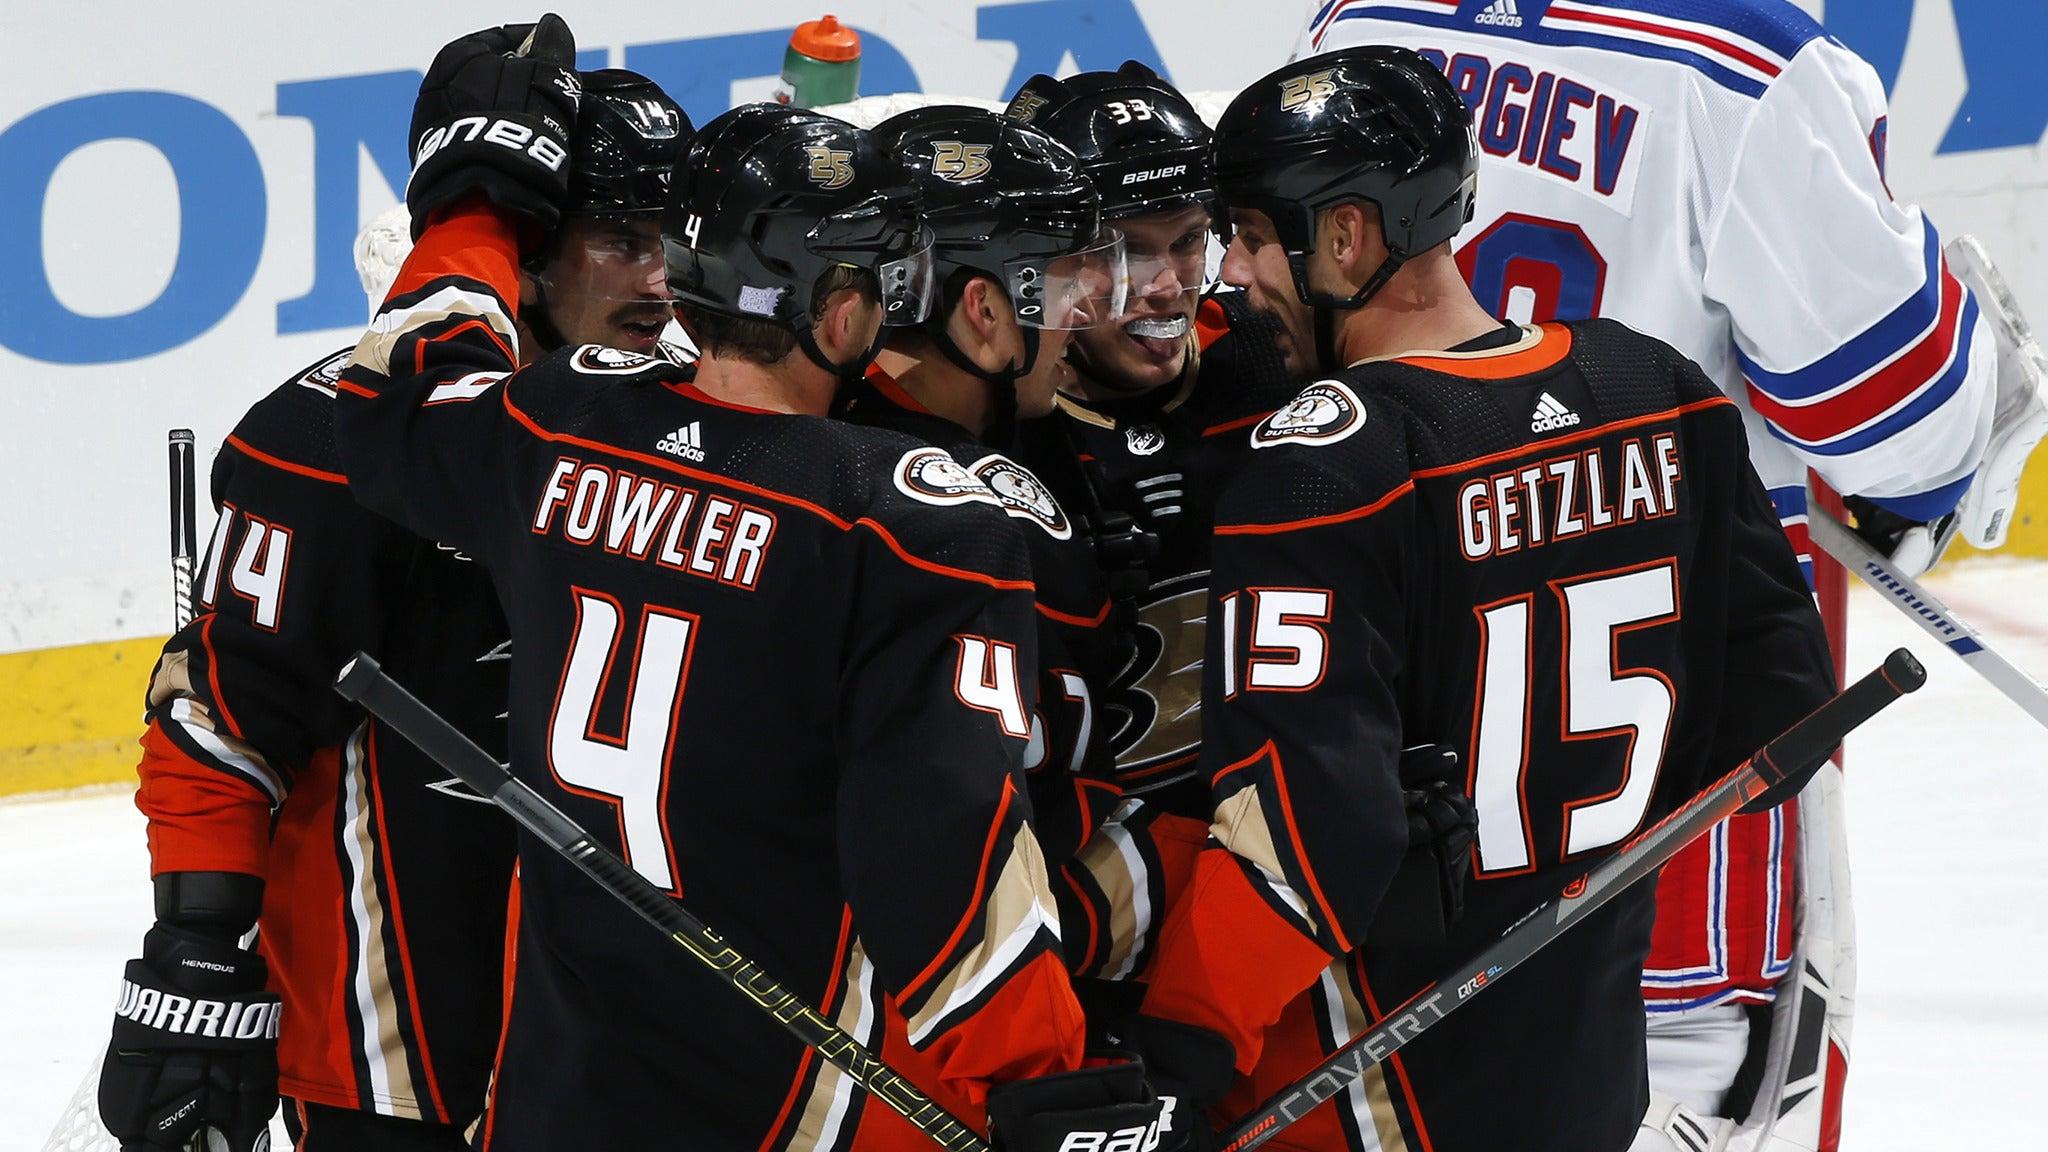 Anaheim Ducks vs. Winnipeg Jets at Honda Center